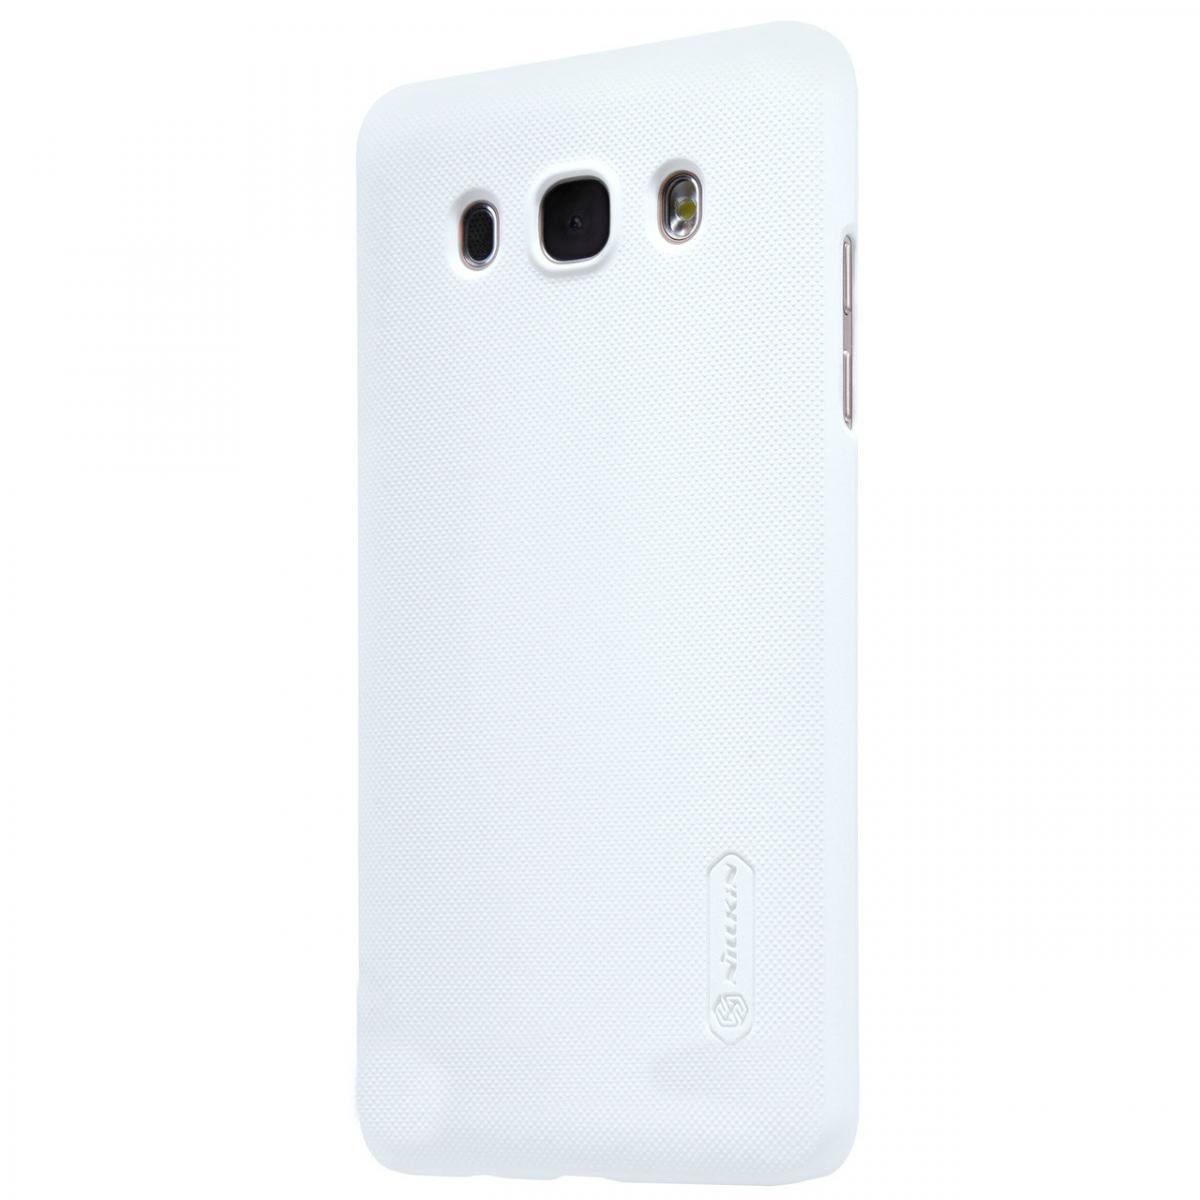 Чехол-накладка Deppa Air Case для Samsung Galaxy J5 (2016) SM-J510 пластиковый белыйдля Samsung<br>Чехол-накладка Deppa Air Case для Samsung Galaxy J5 (2016) SM-J510 пластиковый белый<br>